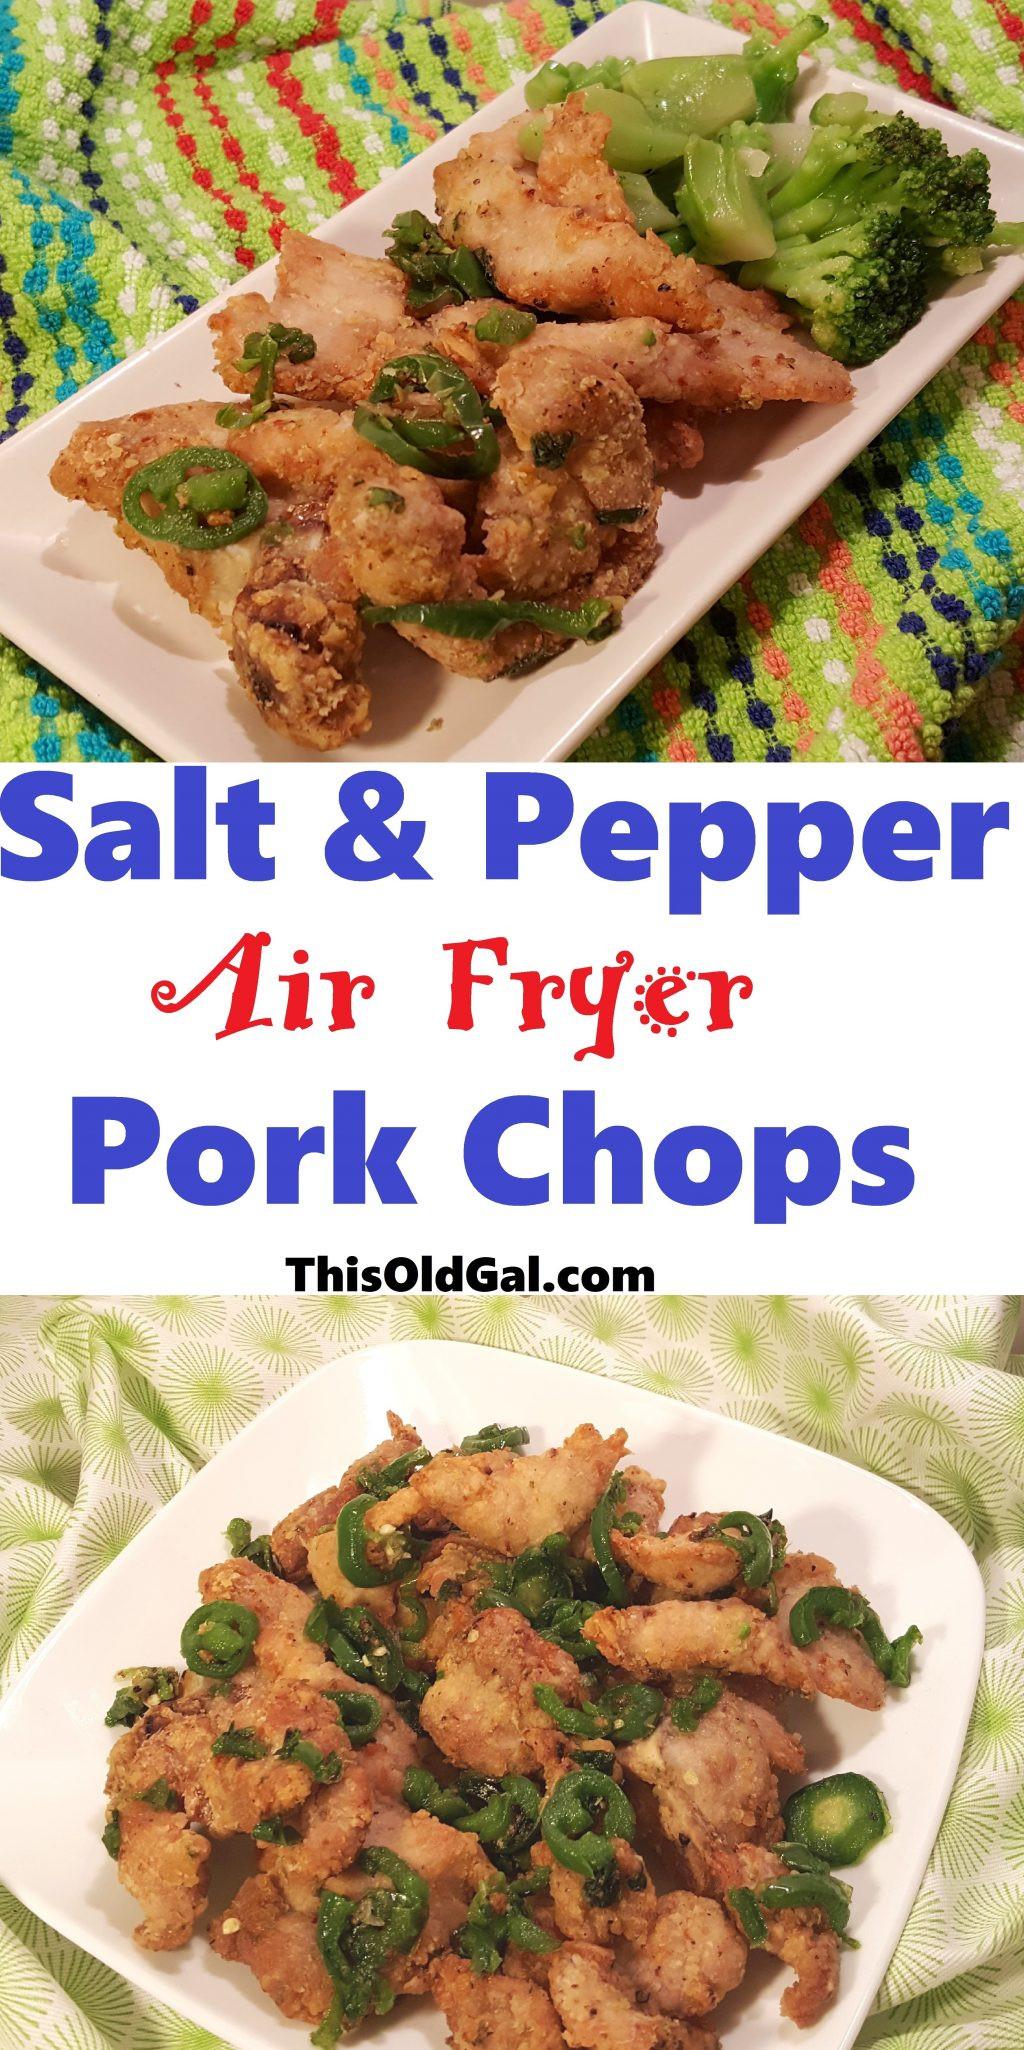 Air Fryer Pork Chops  Air Fryer Chinese Salt and Pepper Pork Chops